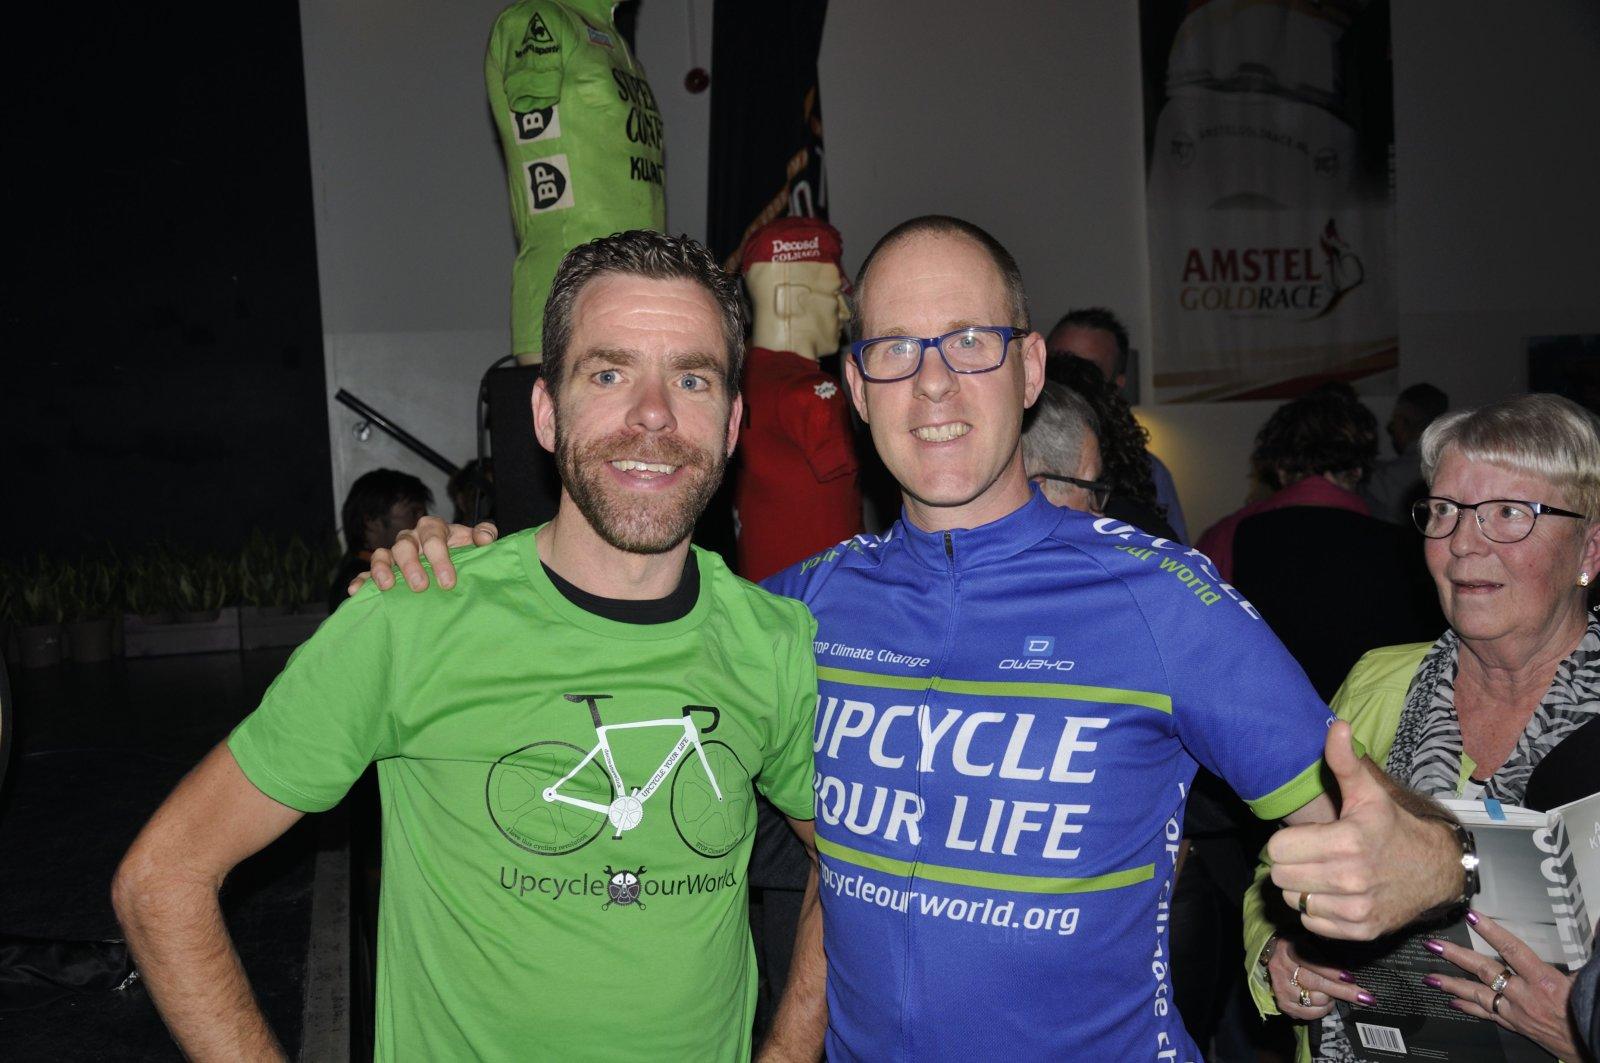 Milieubewuste Wielrenner Bram Tankink Word Beschermheer Vd Duurzame Fietsbeweging Cyclingteam Upcycle Your Life